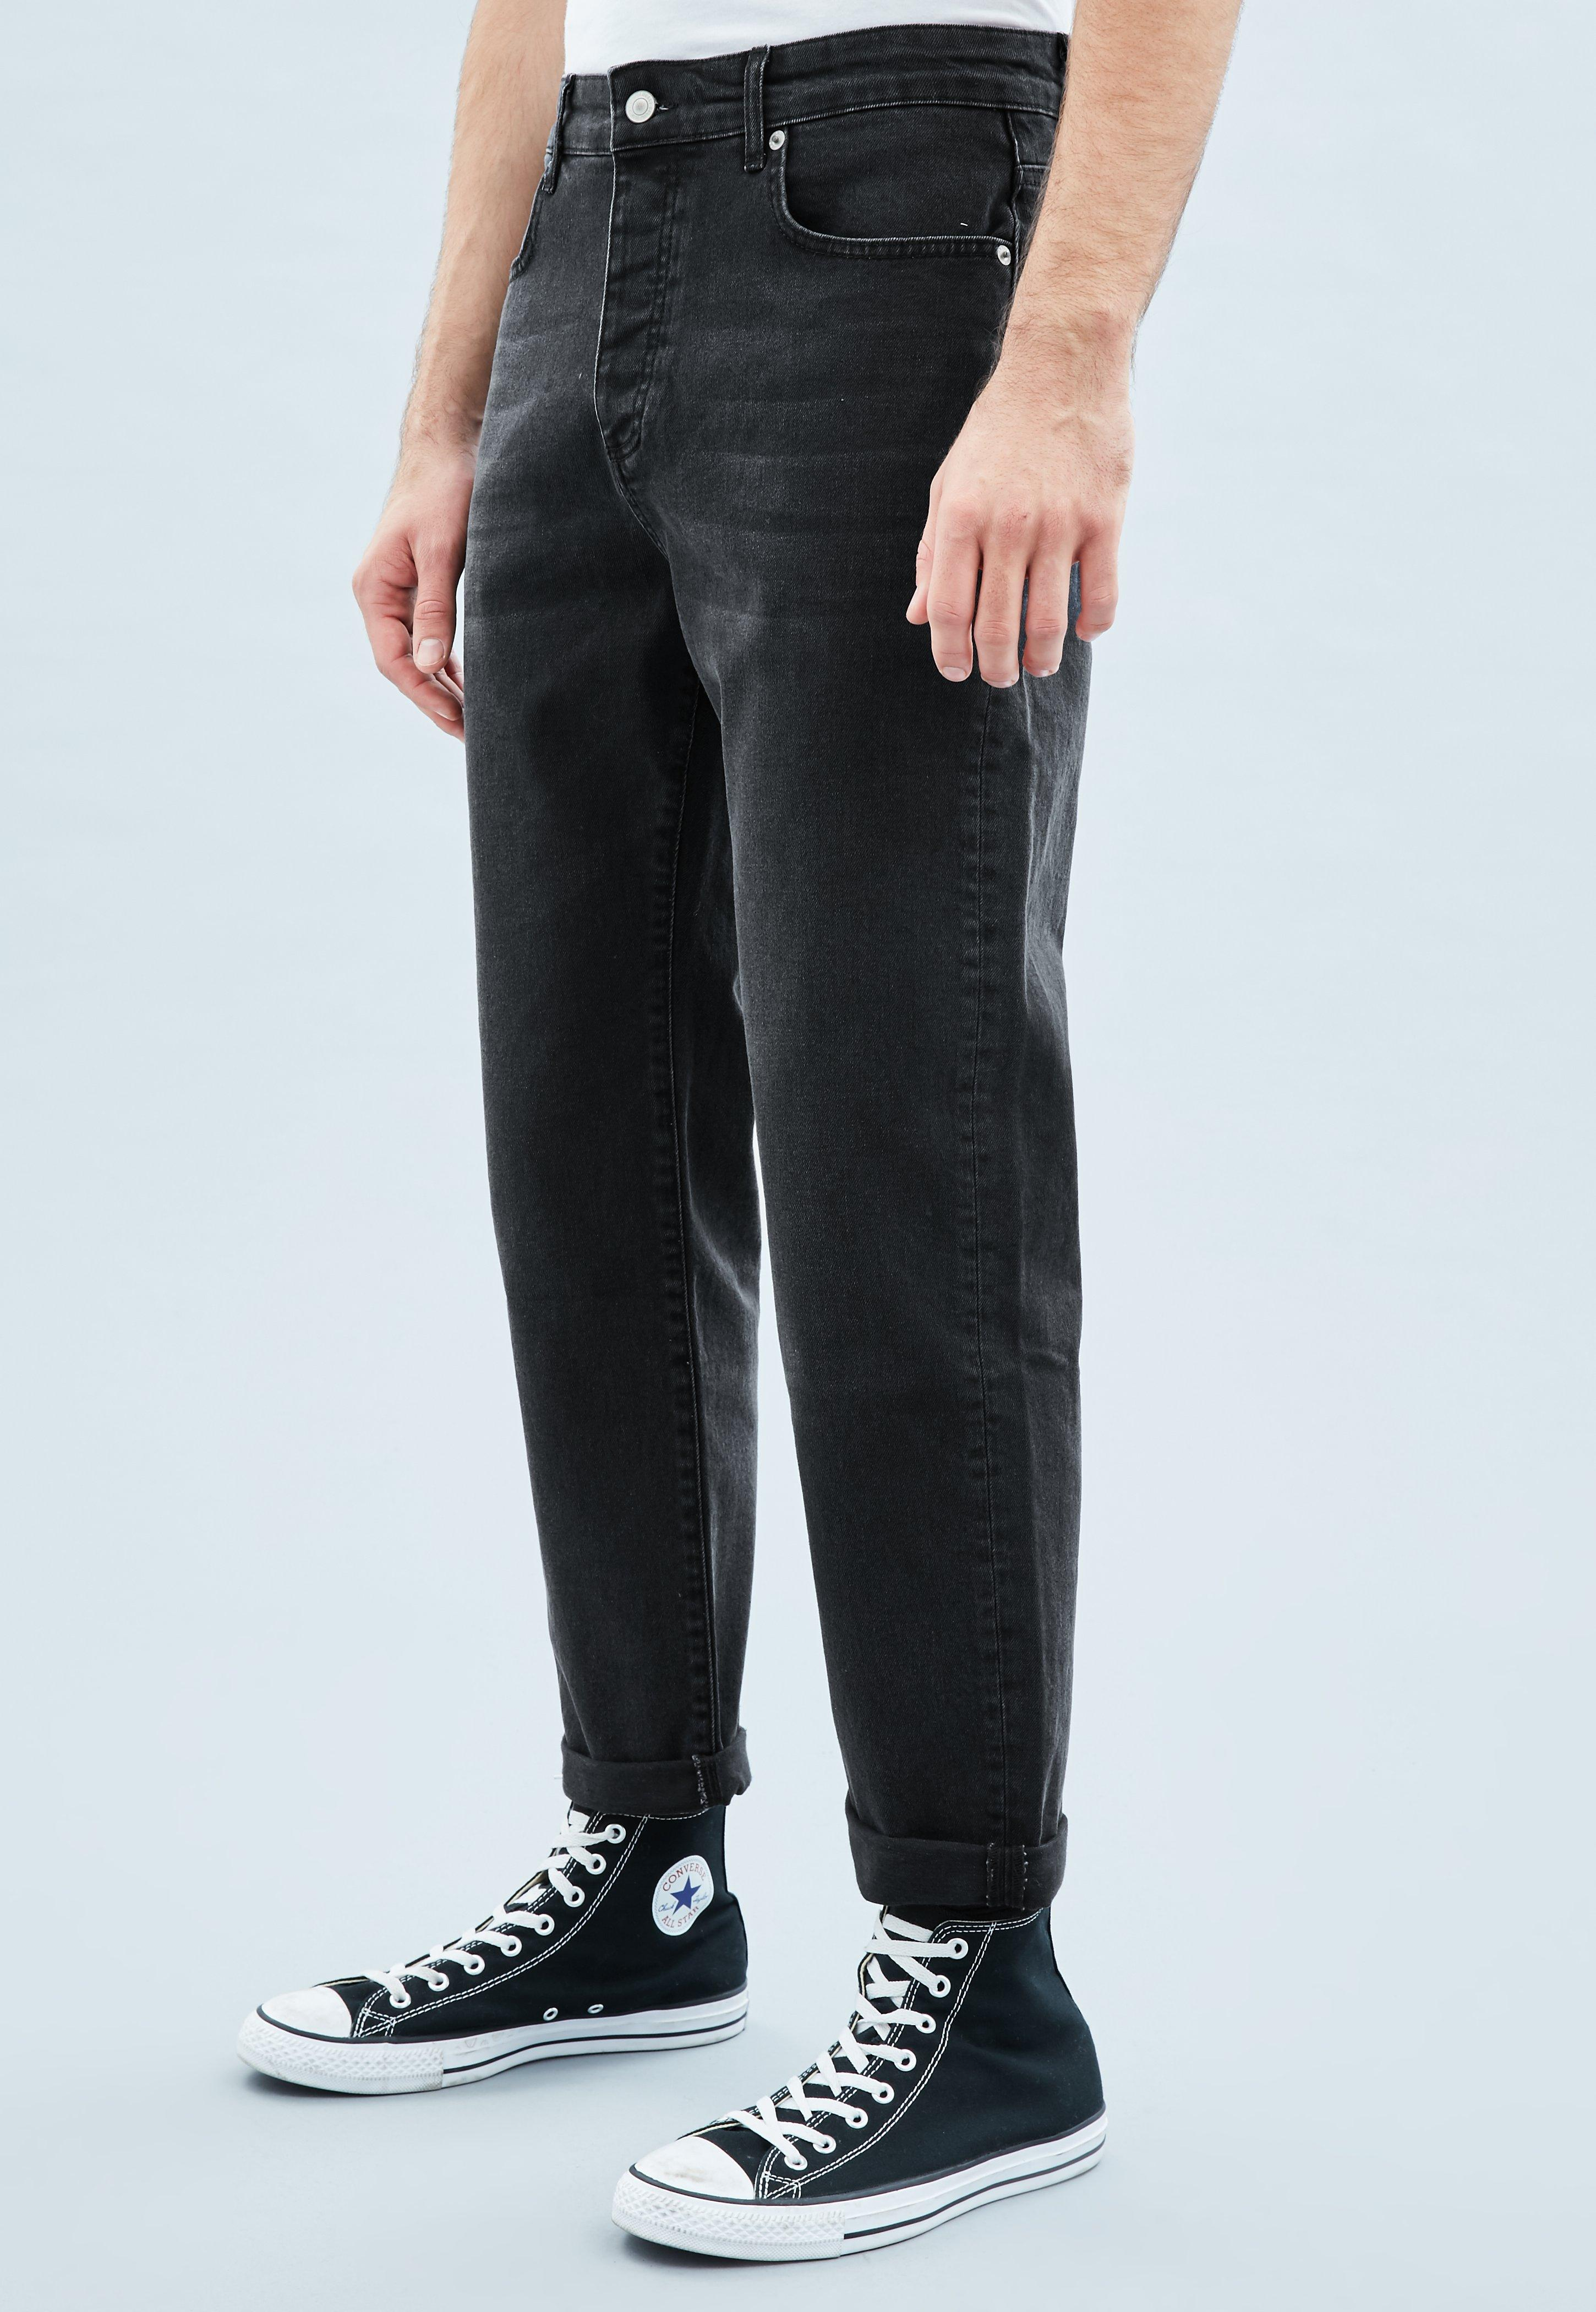 Denim Black jeans pictures exclusive photo